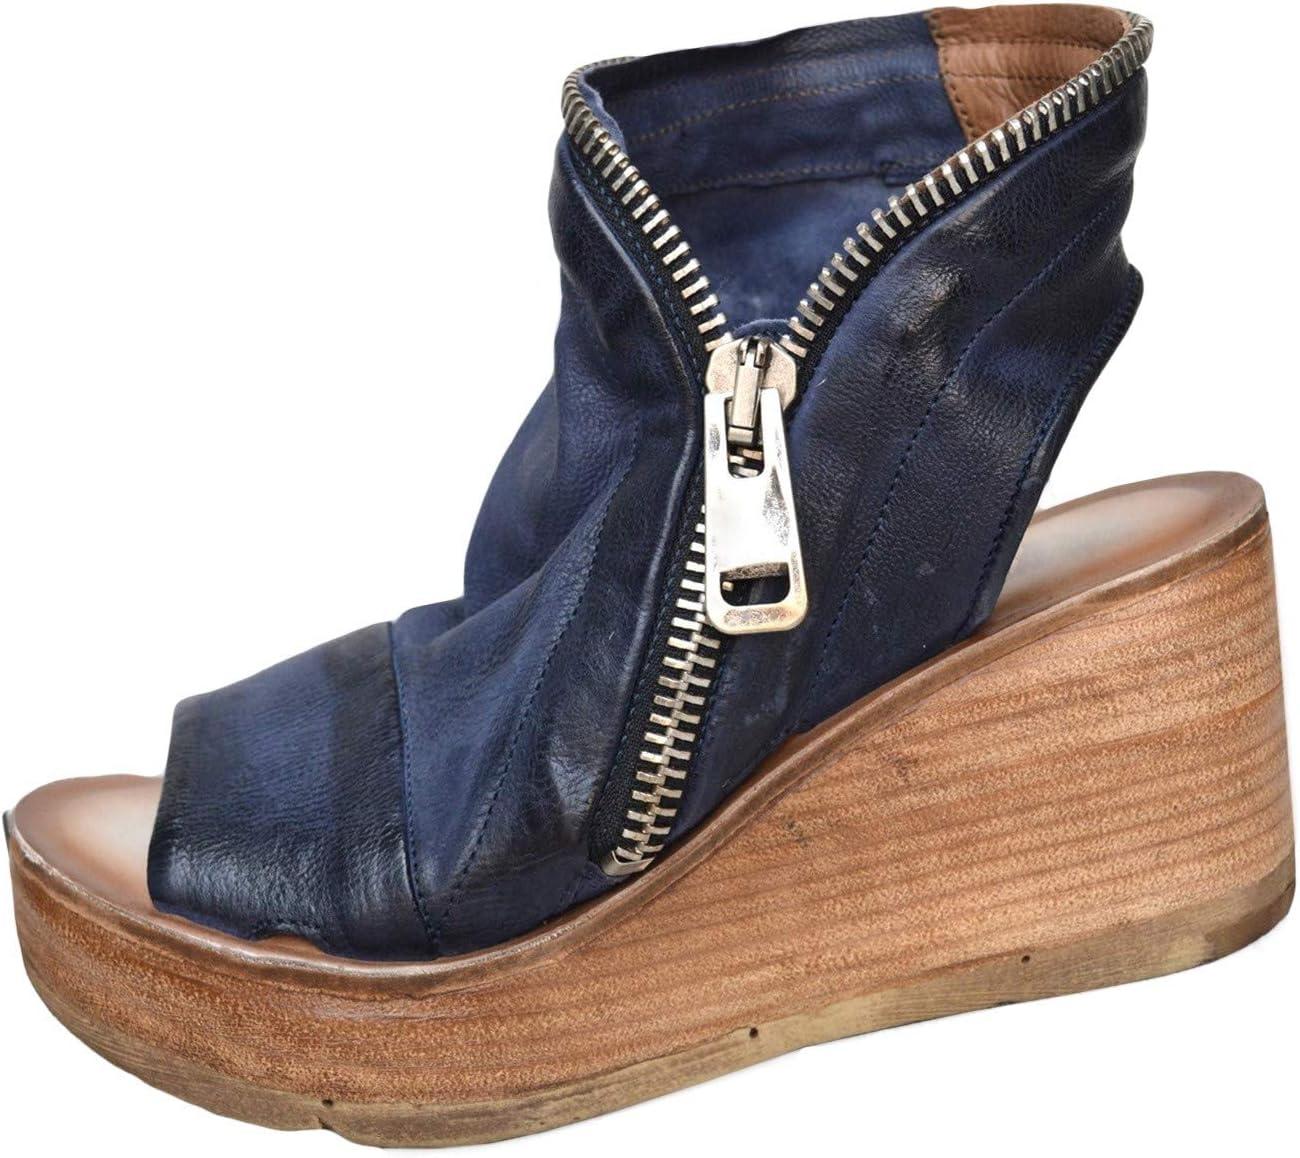 Pursue 新品 送料無料 Sandals for Women Dressy Open Zipper Platform S Ankle Toe ☆最安値に挑戦